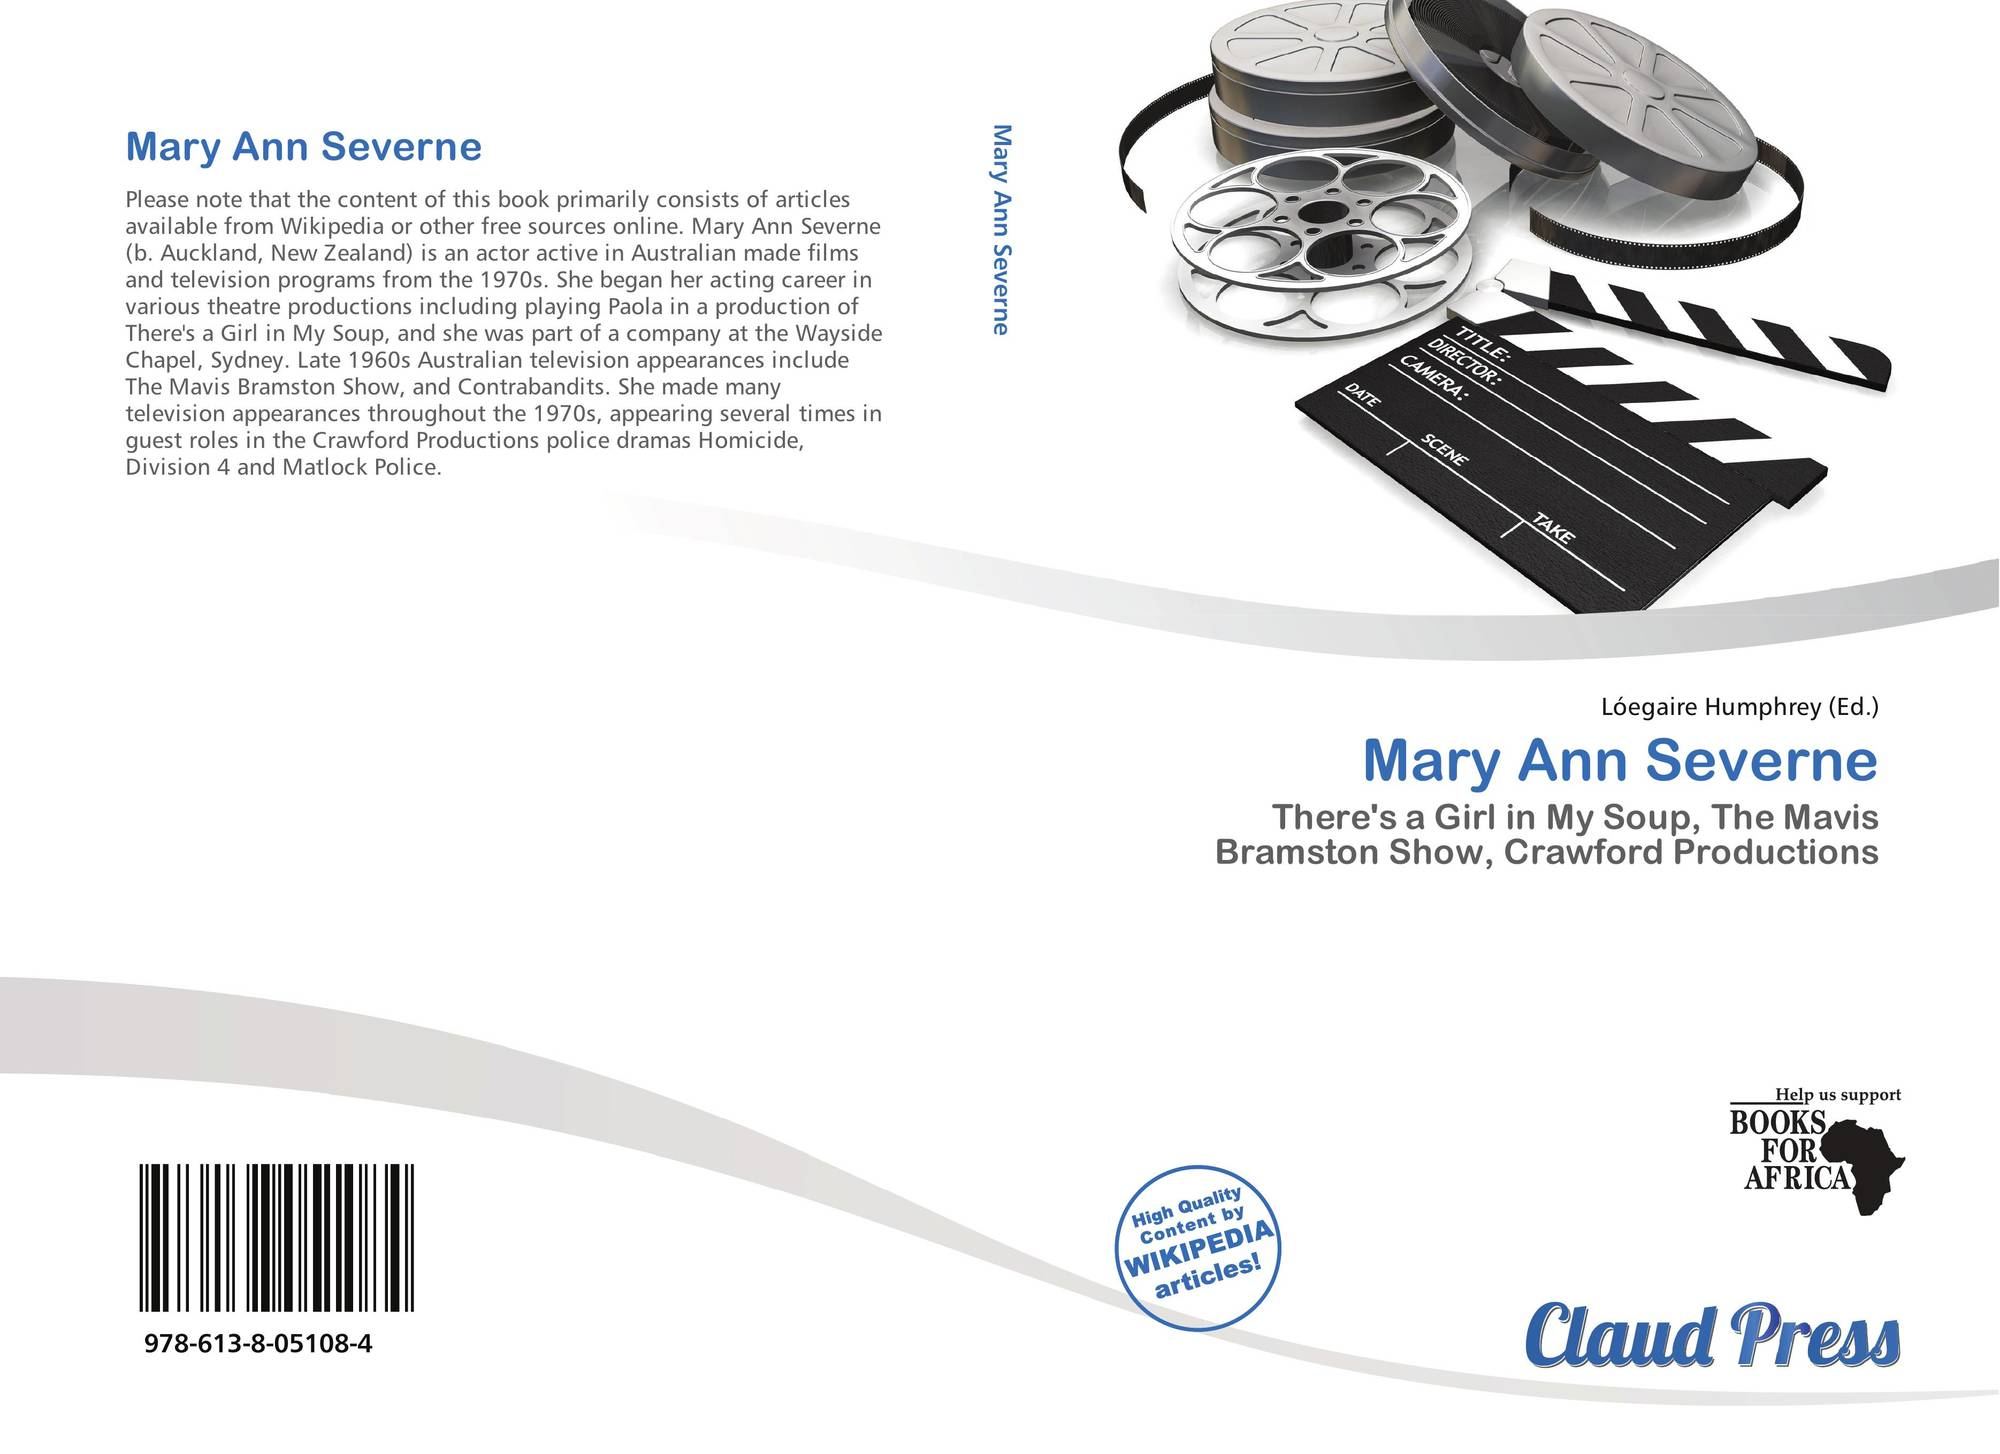 Mary Ann Severne